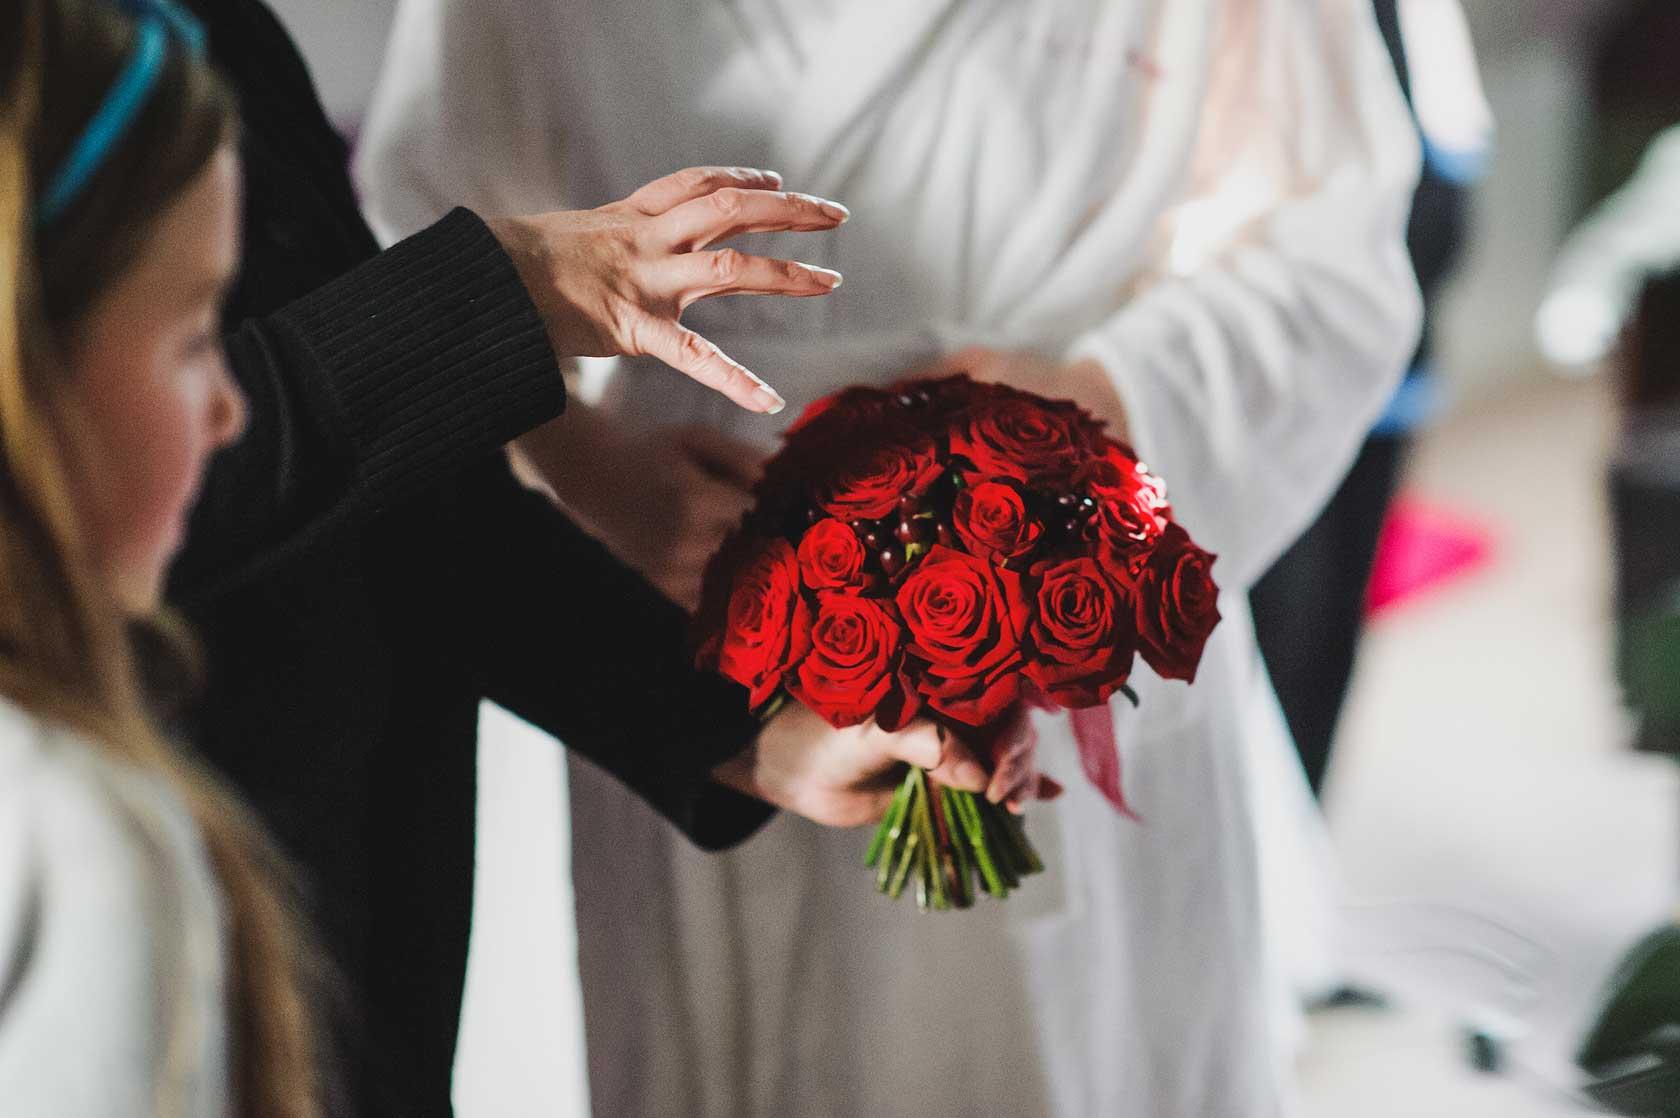 Reportage Wedding Photography at Yorebridge House